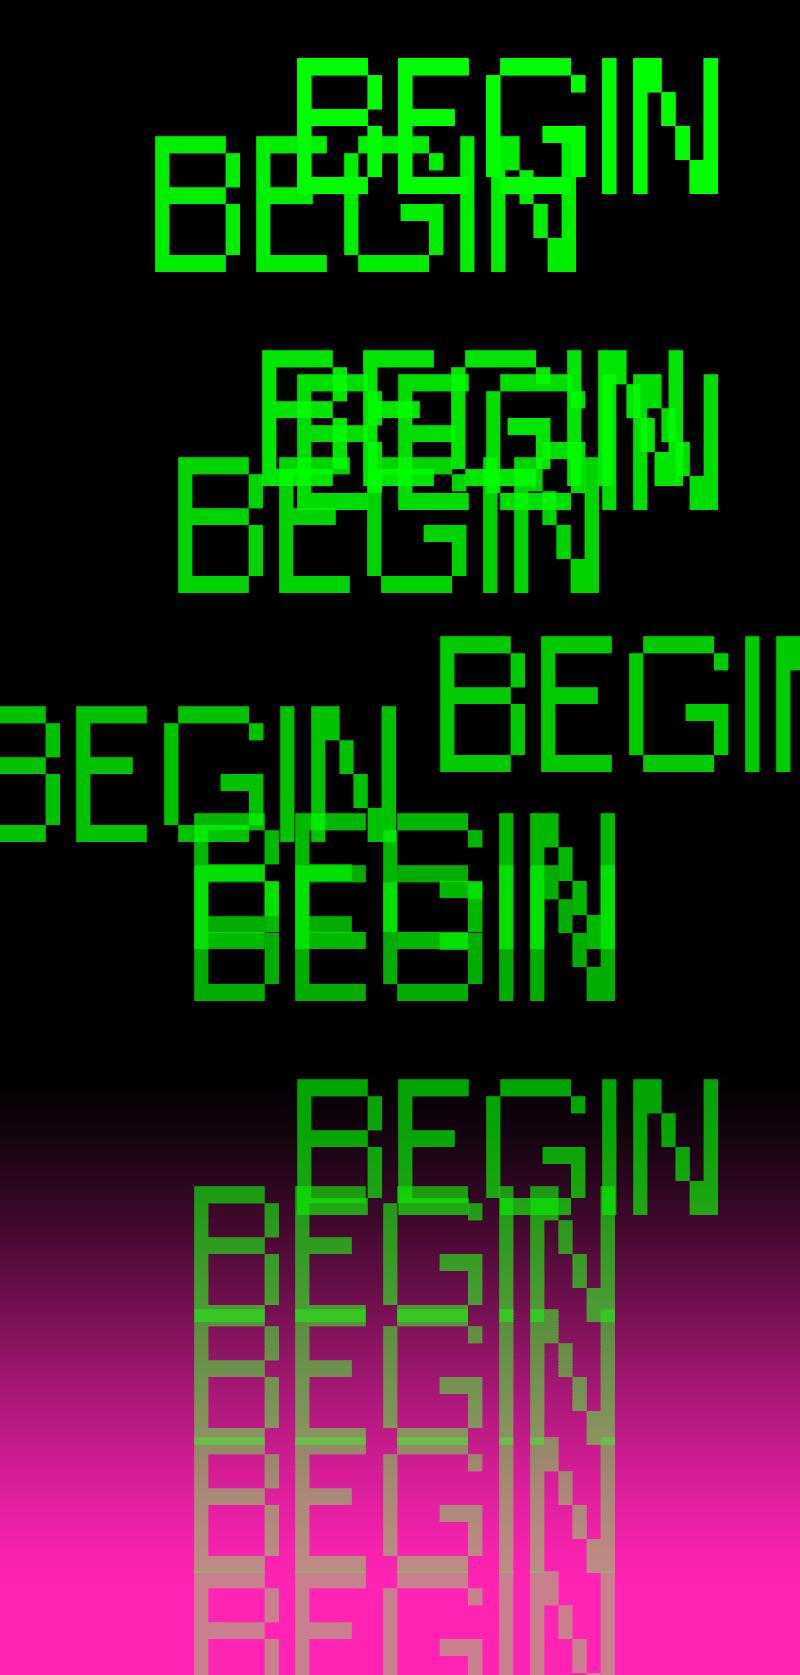 the word begin repeating atop black pink gradient